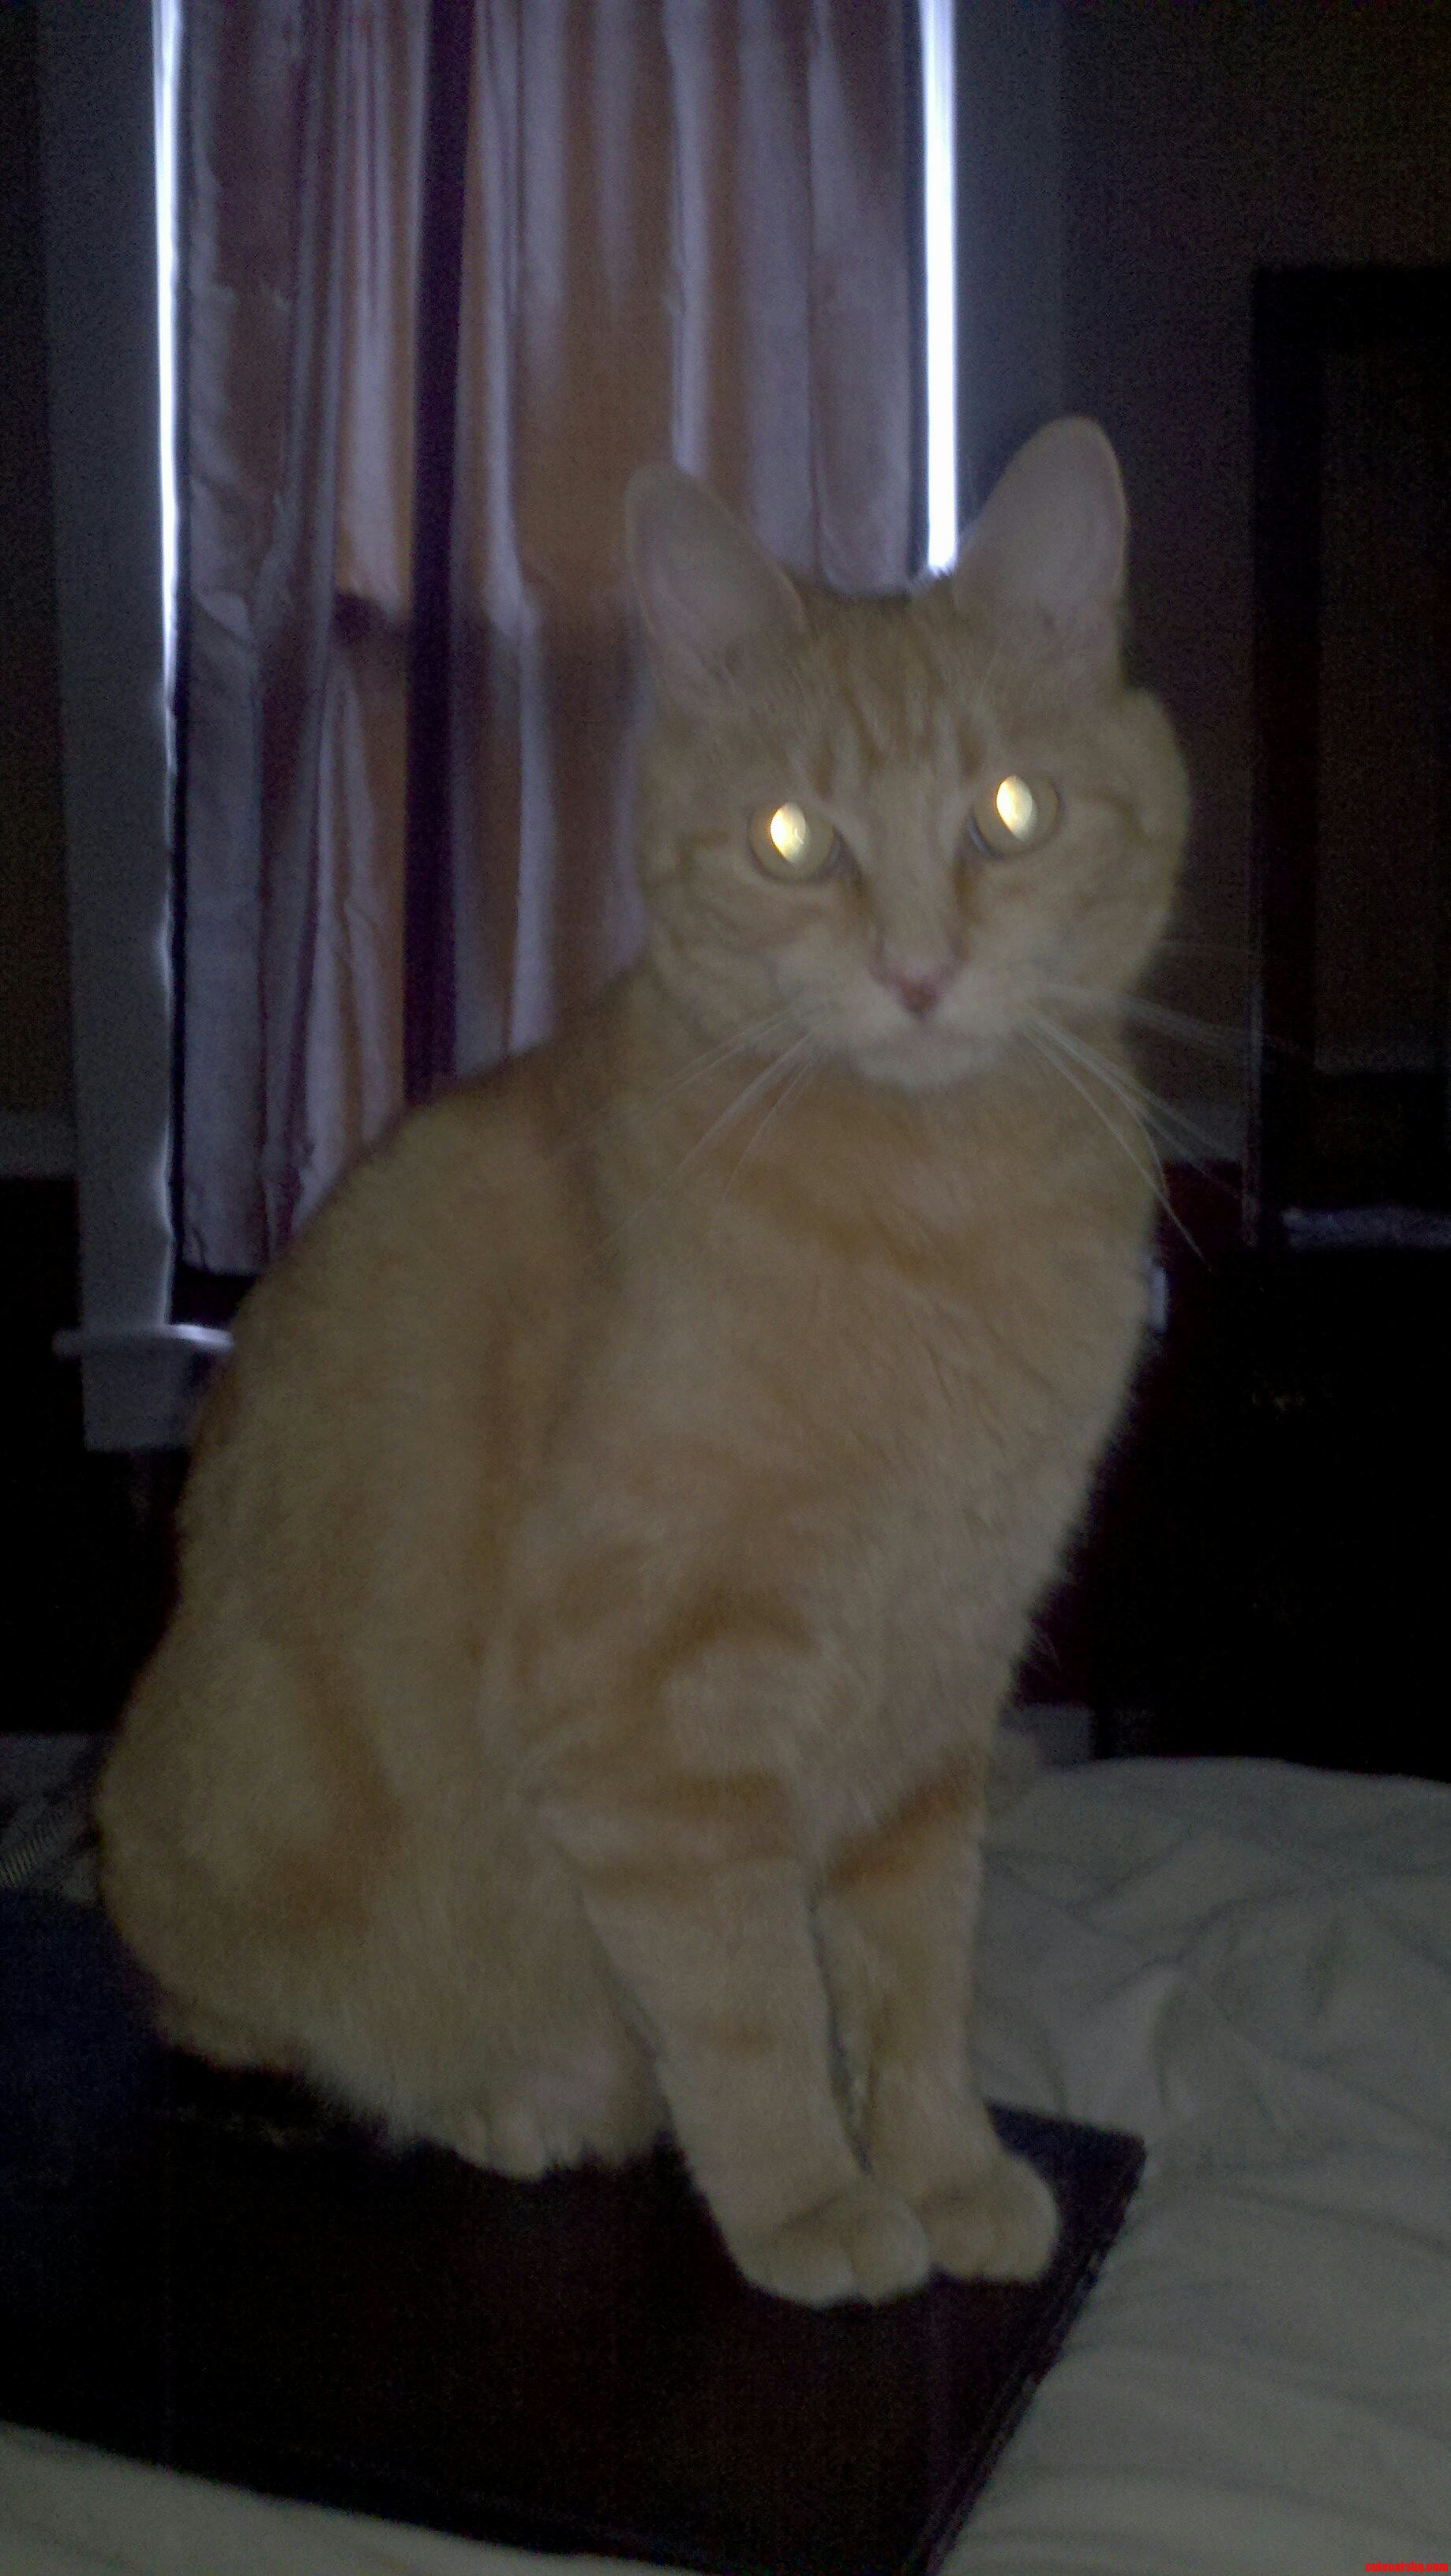 Pwetty Kitty